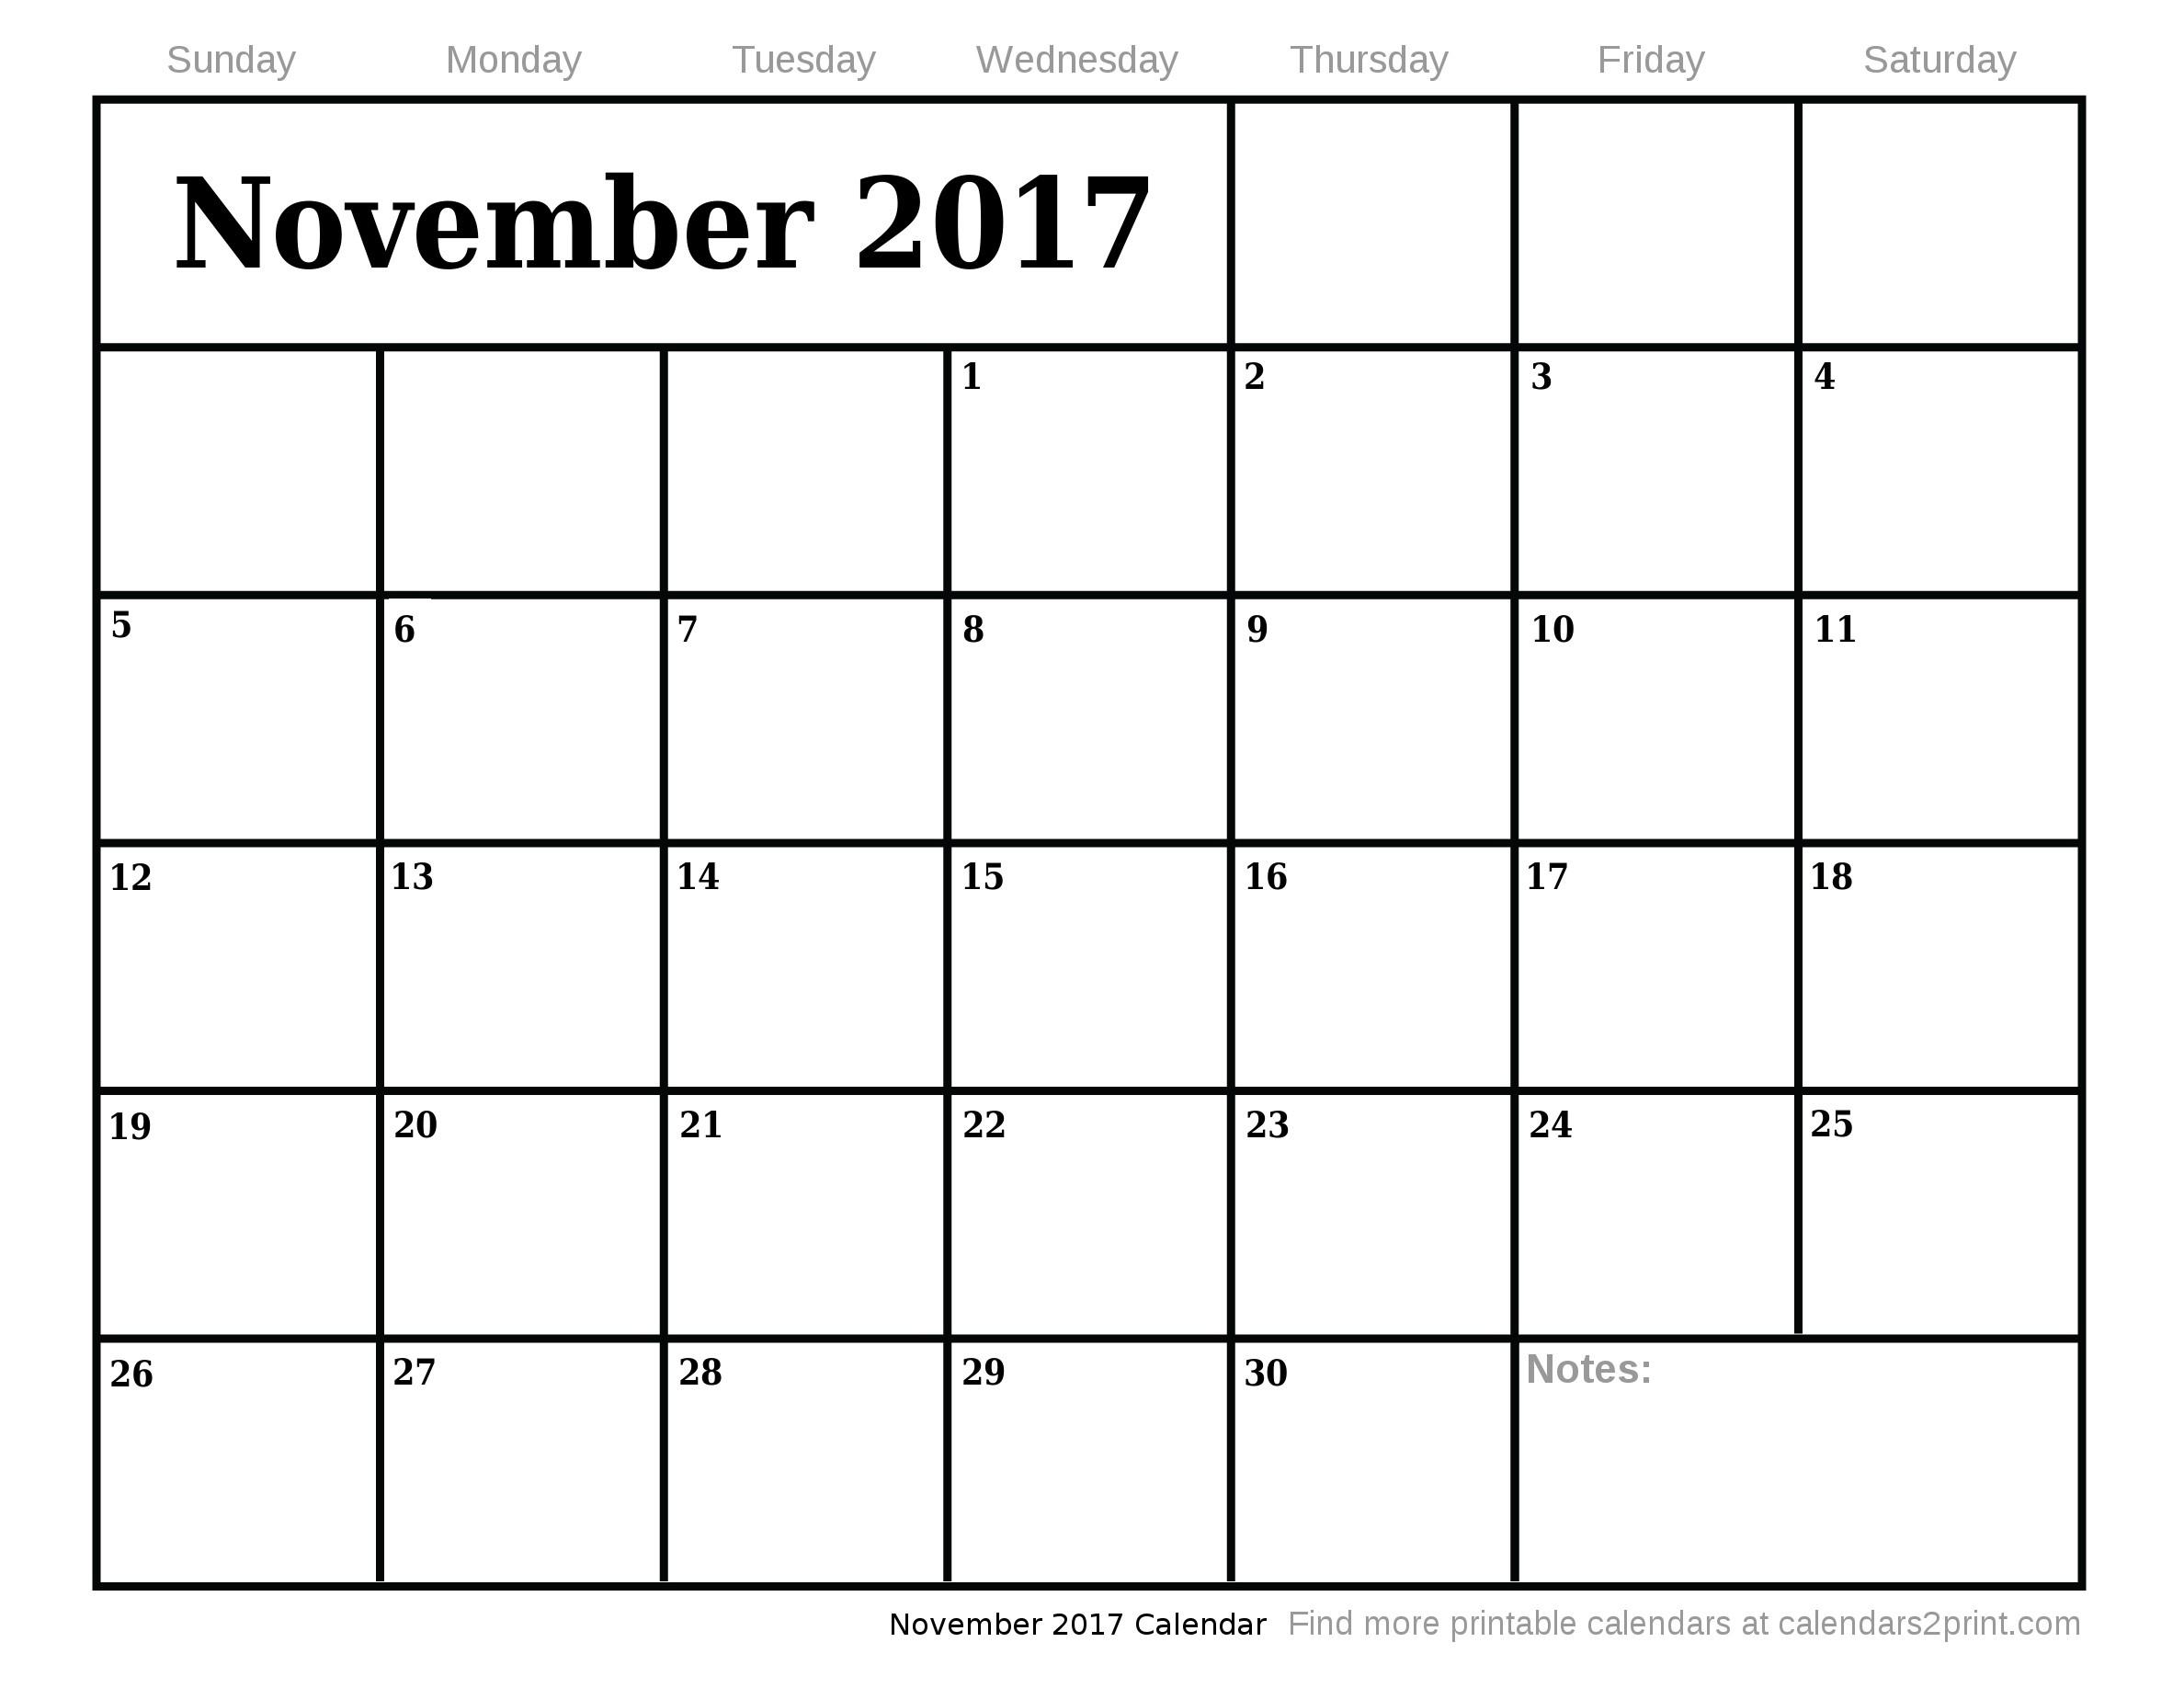 November 2017 Printable Calendar 18 Nov Calendar 2017